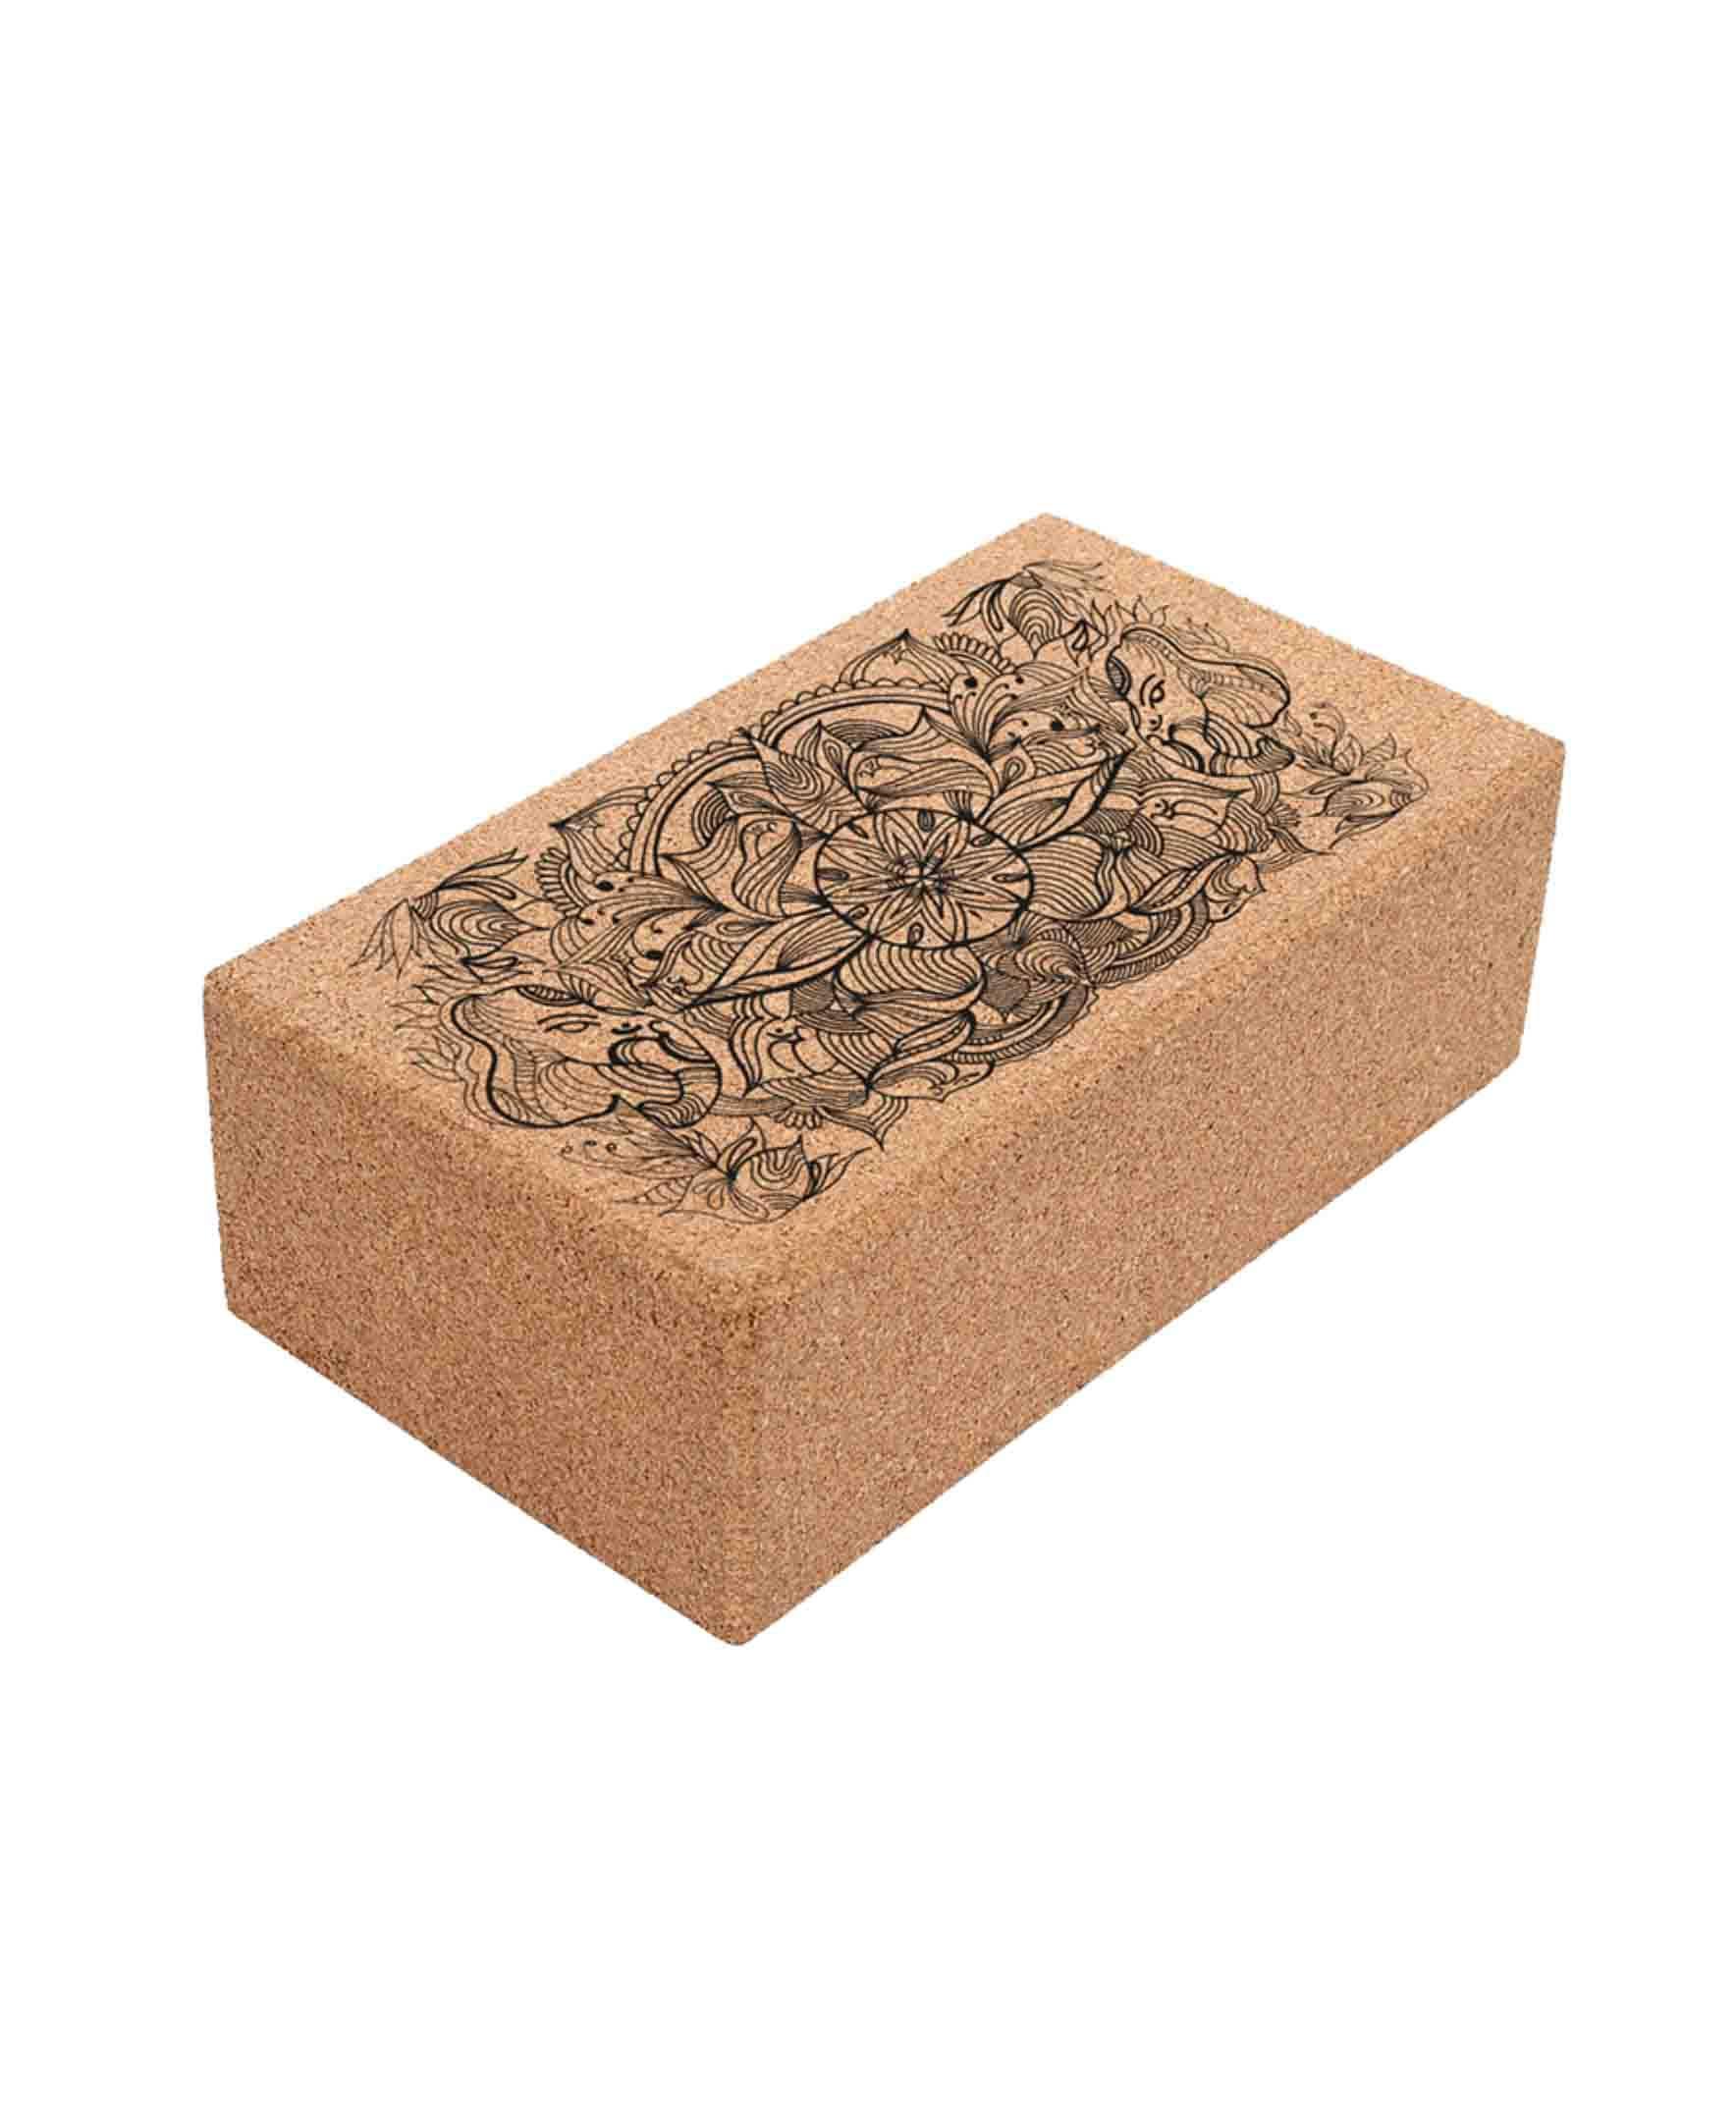 Lift Yoga Cork Block | Trada Marketplace